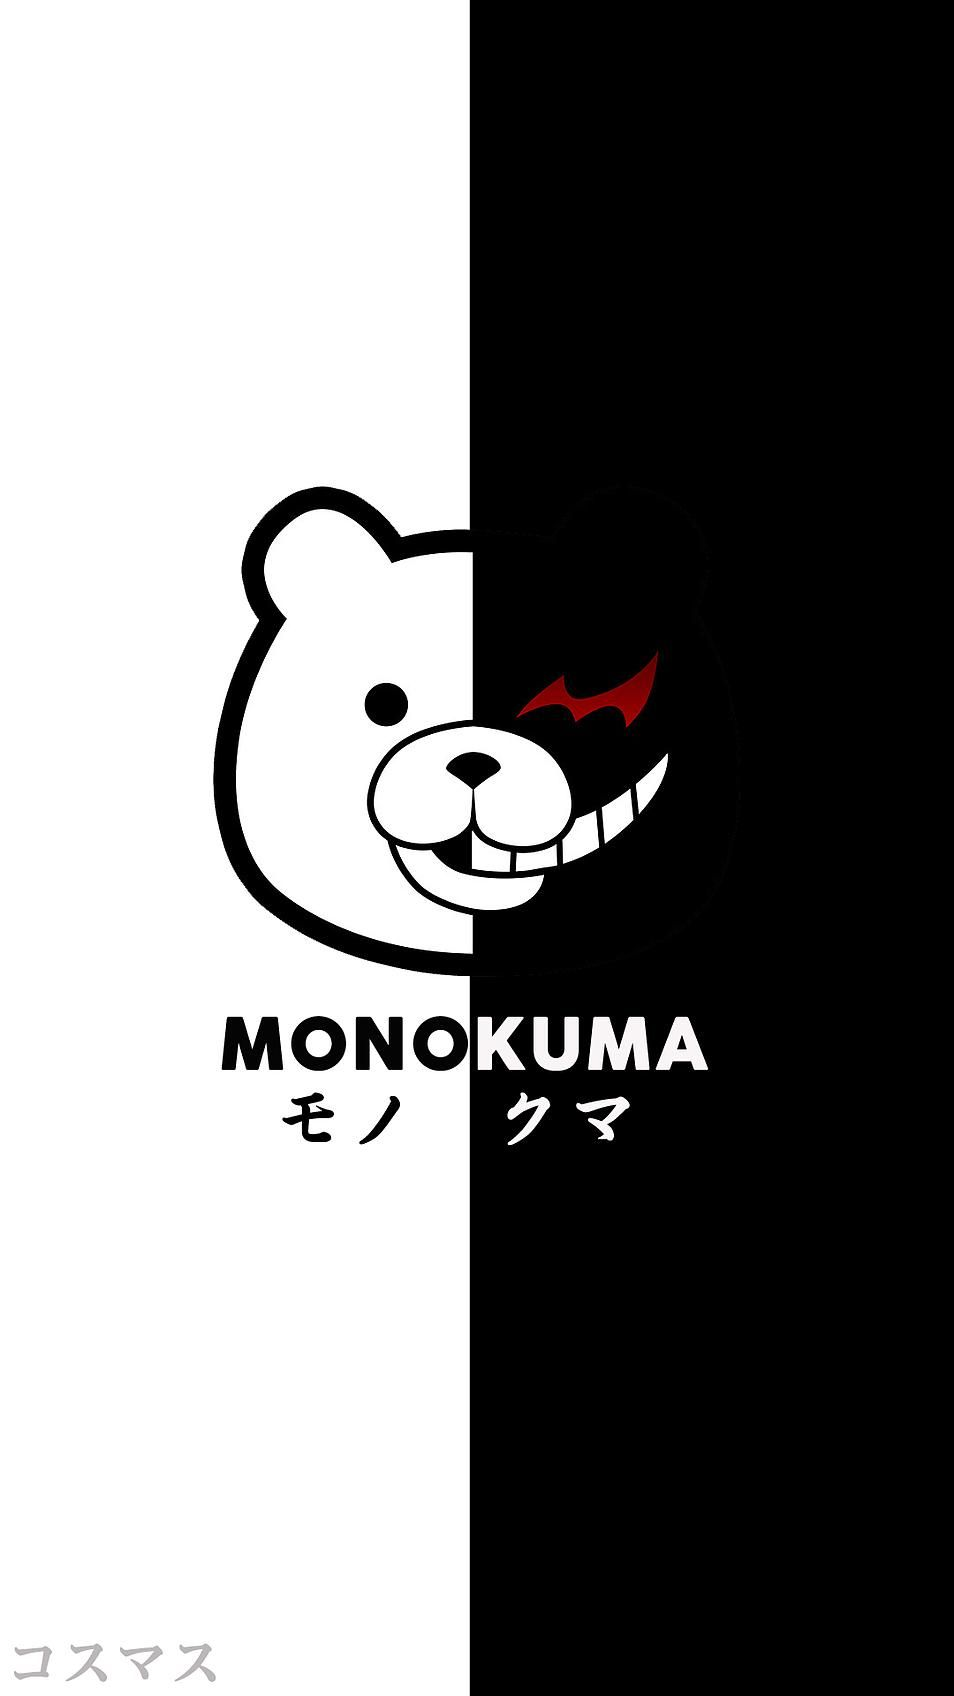 Monokuma 2 Side